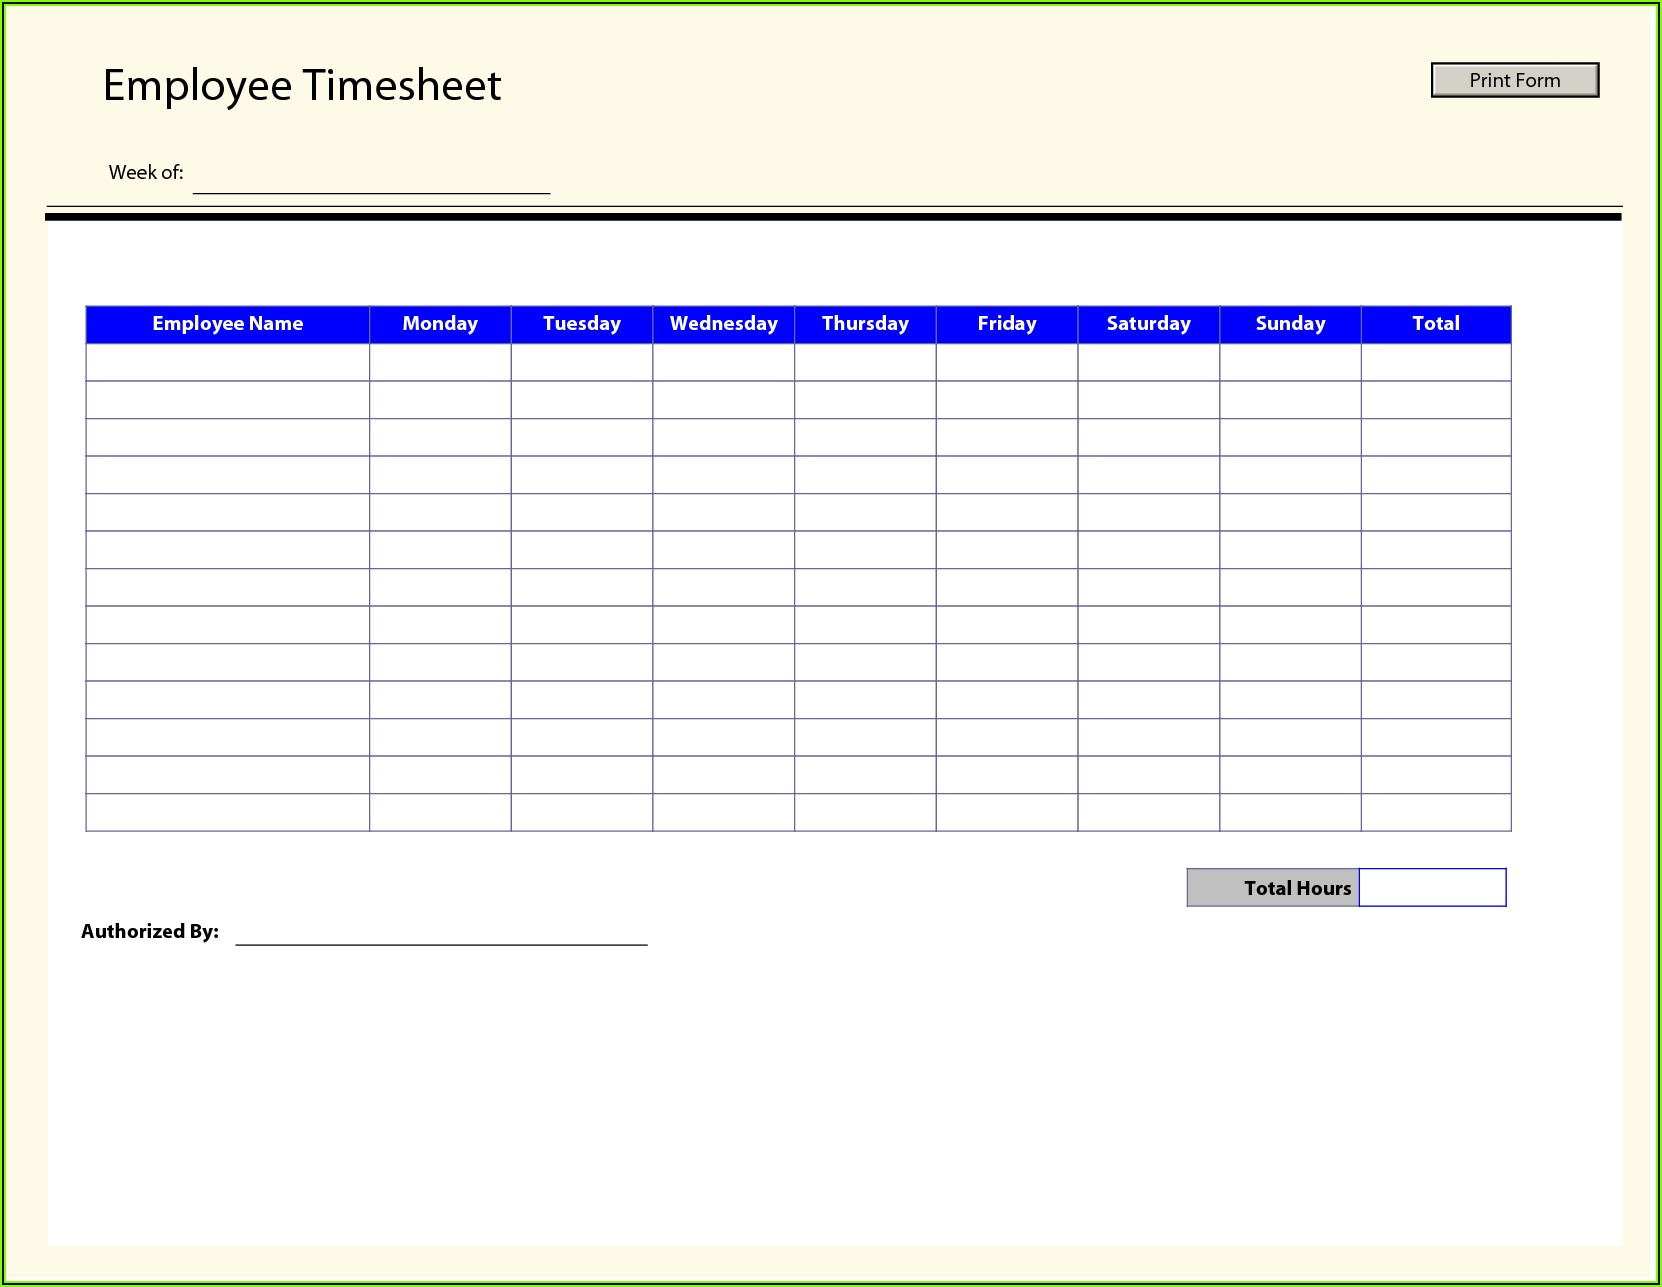 Payroll Timesheet Template Free